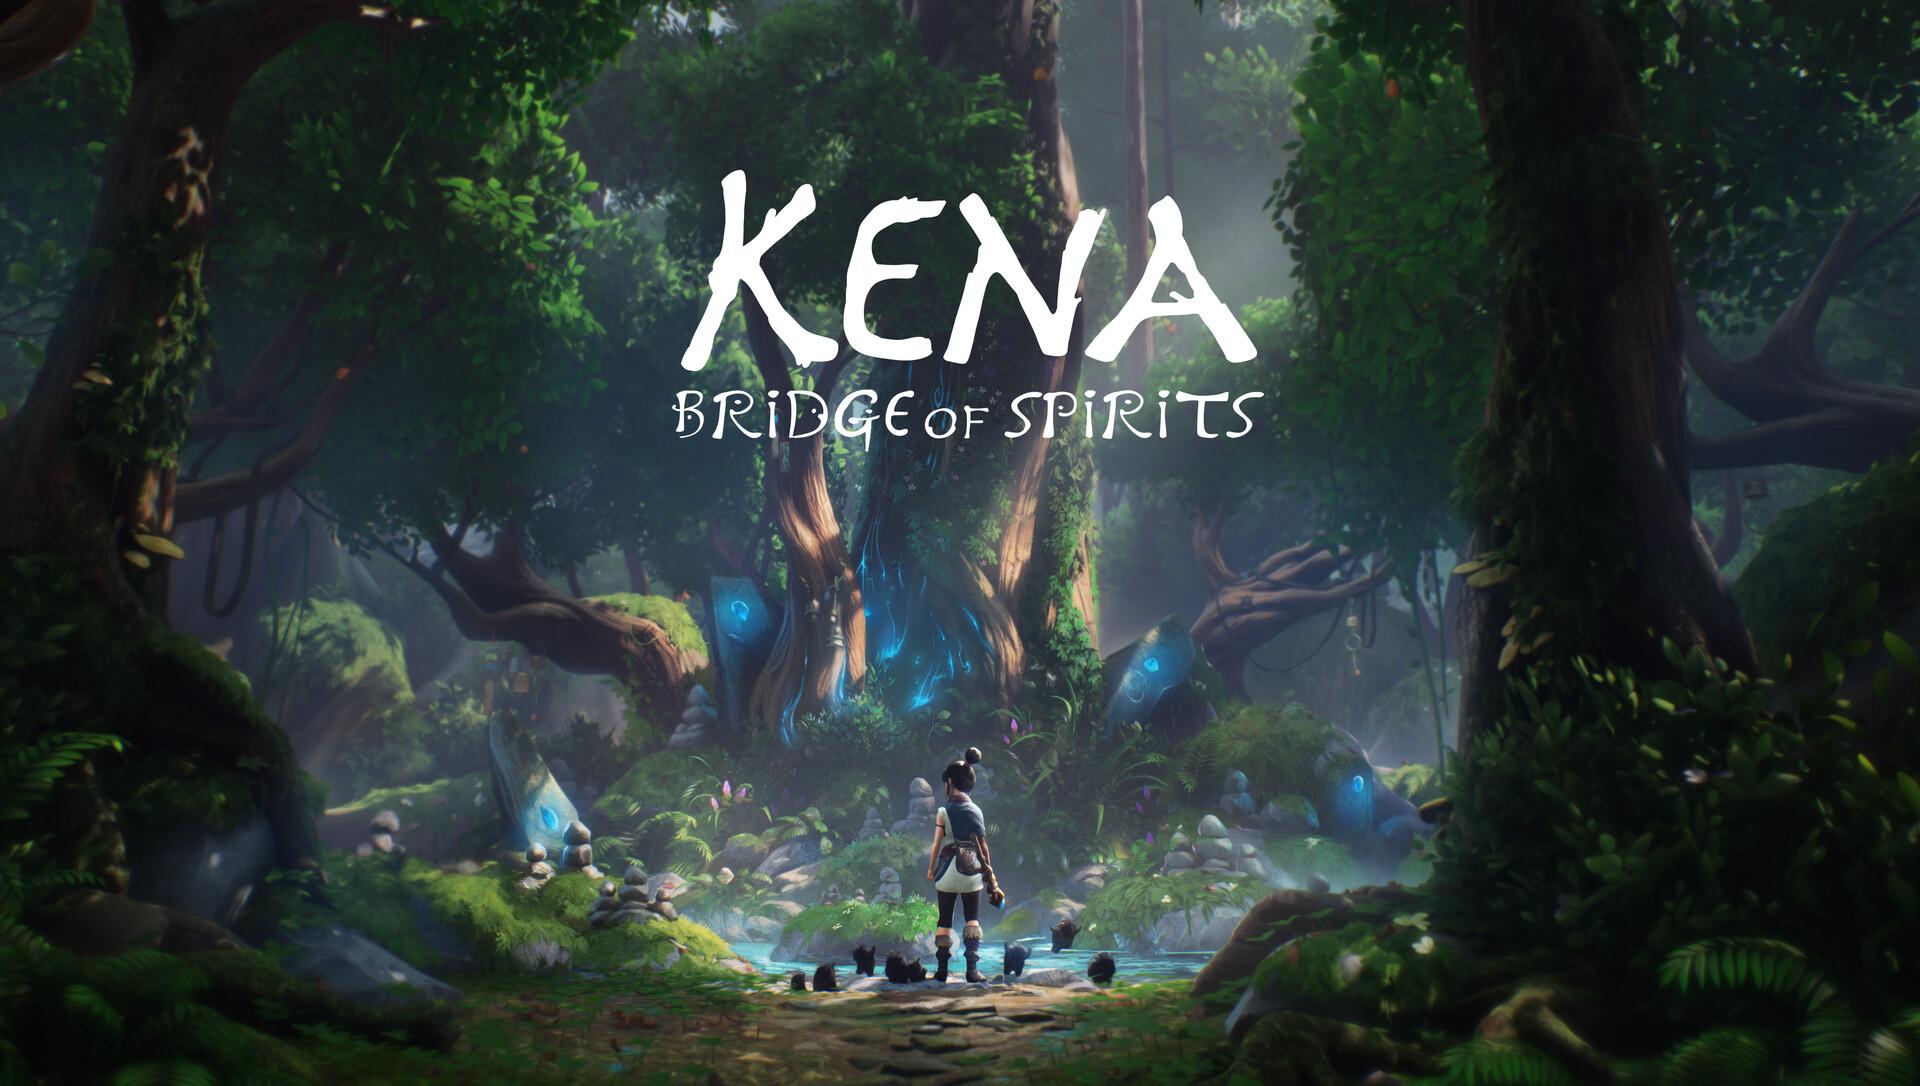 Kena Bridge of Spirits Concept Art